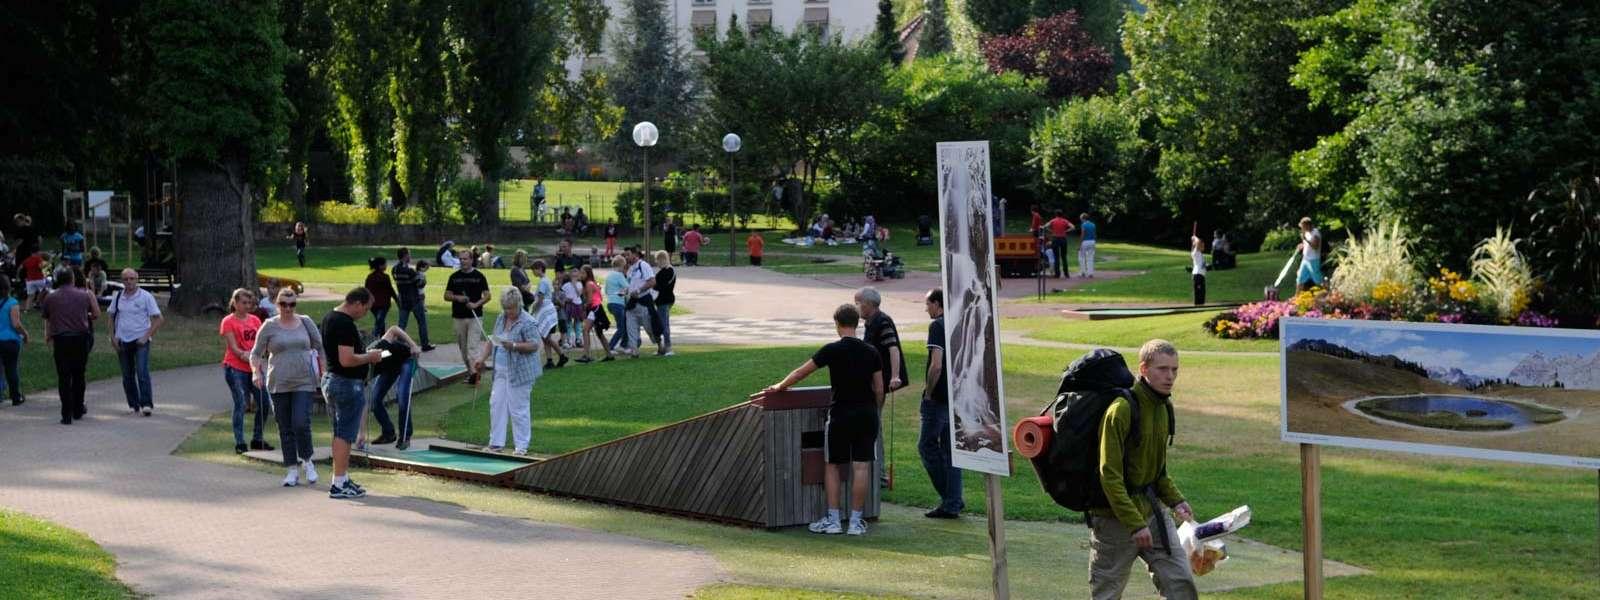 Golf sur piste, Niederbronn-les-Bains, Alsace